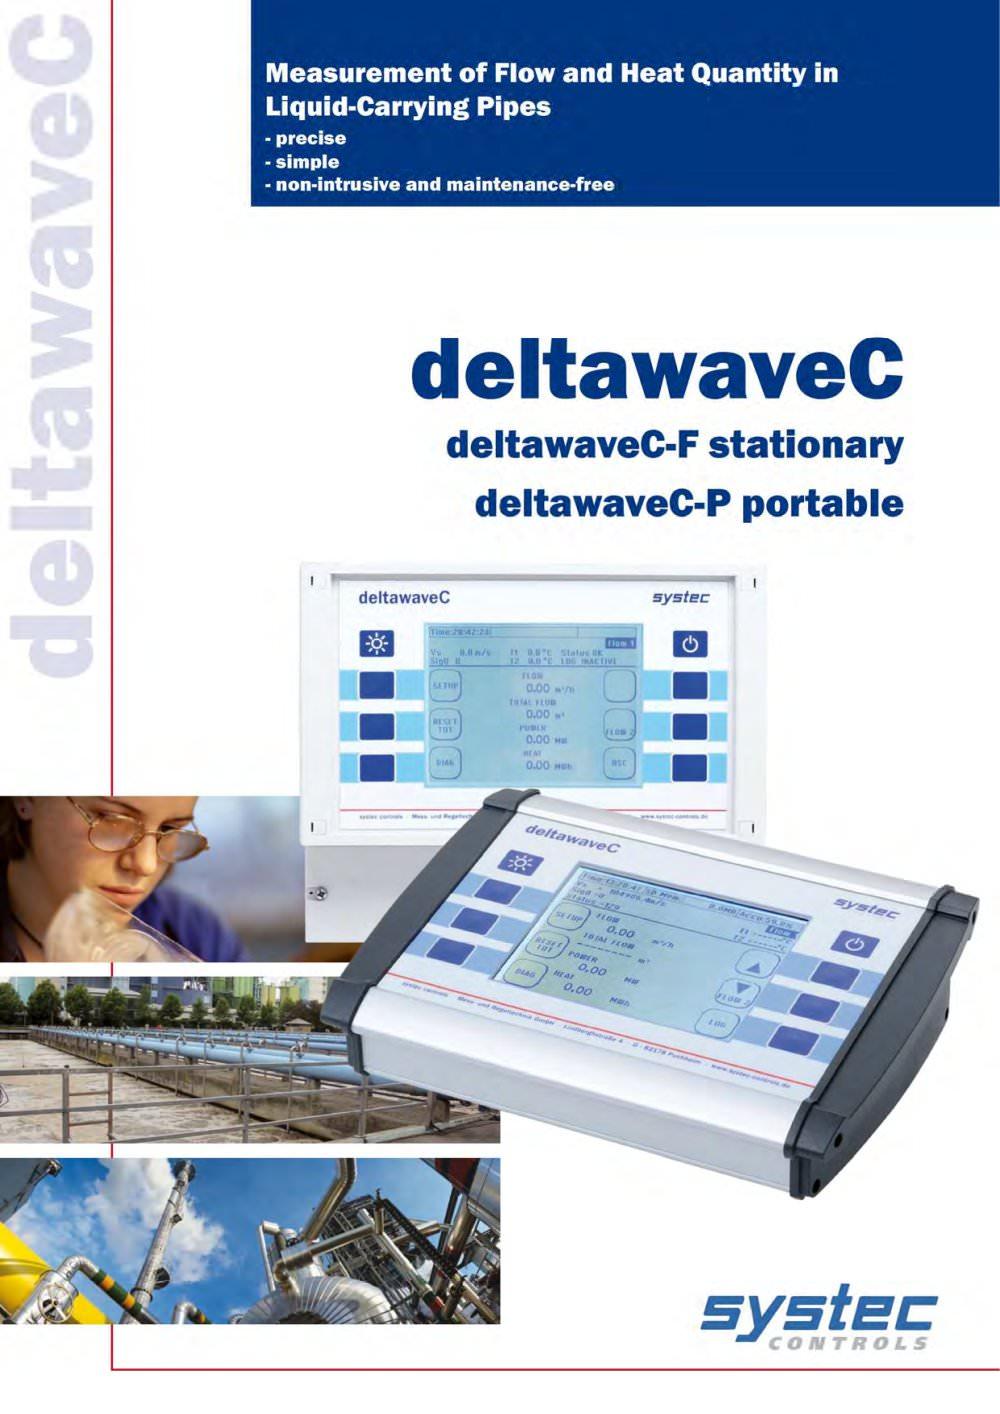 deltawaveC-P portable ultrasonic flow meter for liquids - systec ...